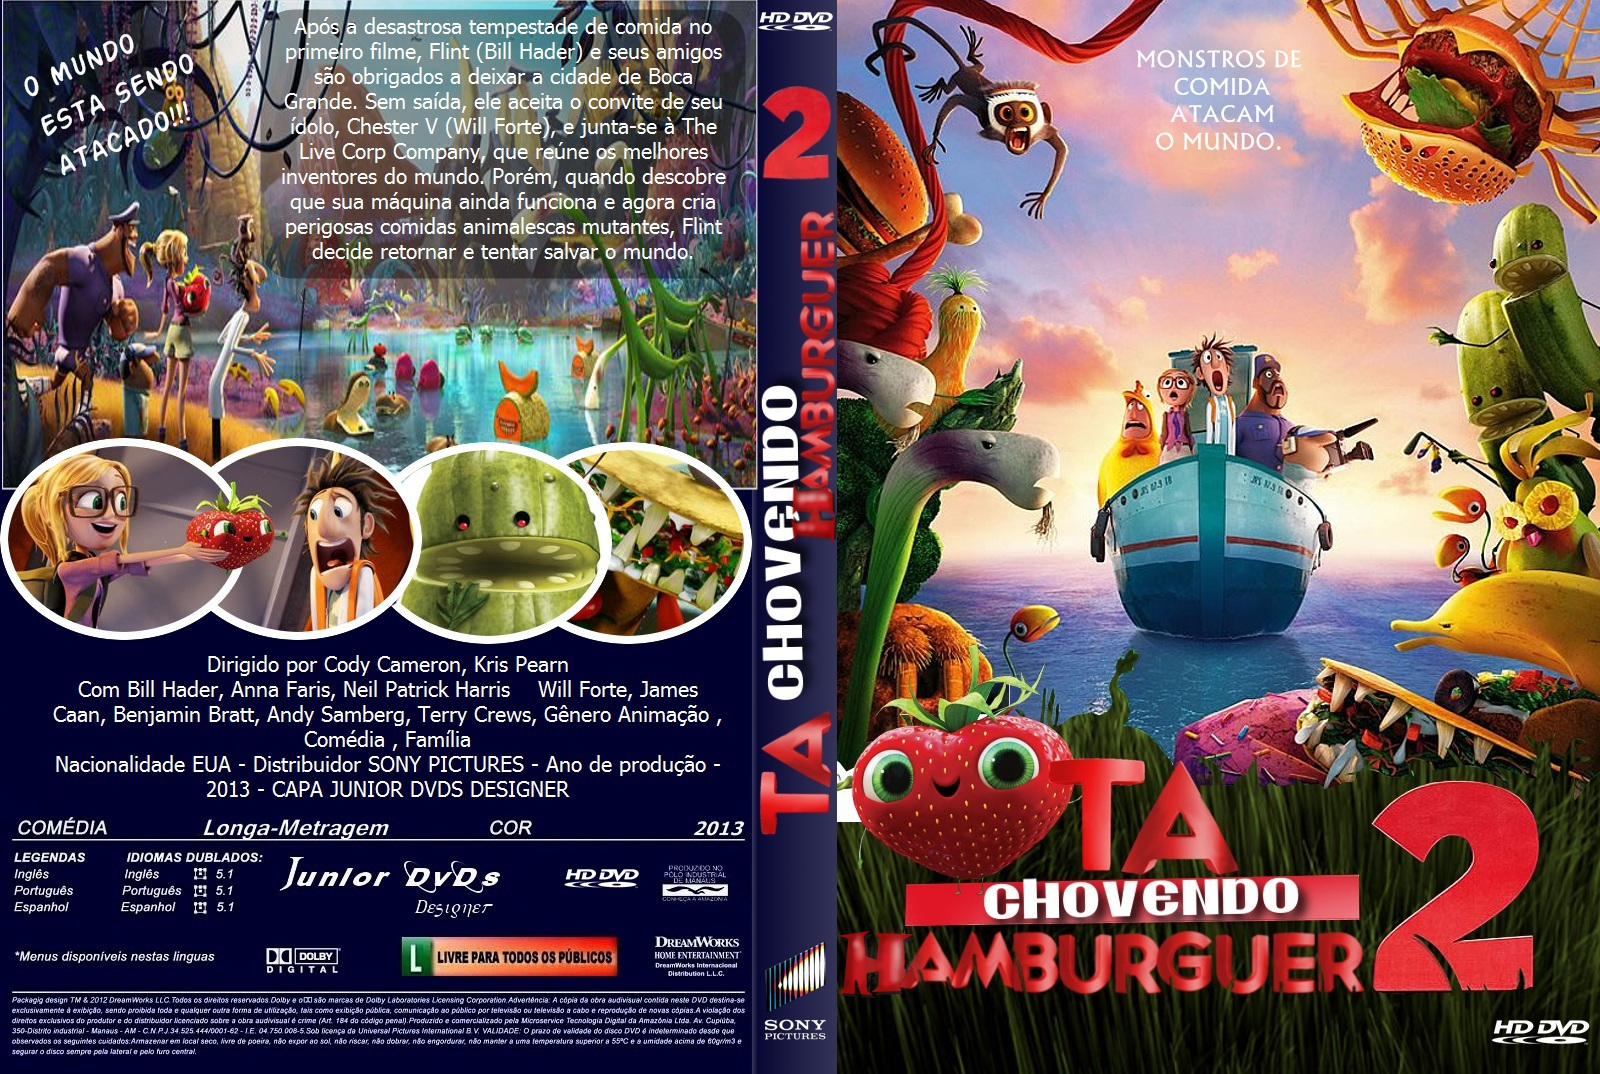 Filme Ta Chovendo Hamburguer Dublado Completo pertaining to tá chovendo hambúrguer 2 ts xvid e rmvb dublado - xandao download™